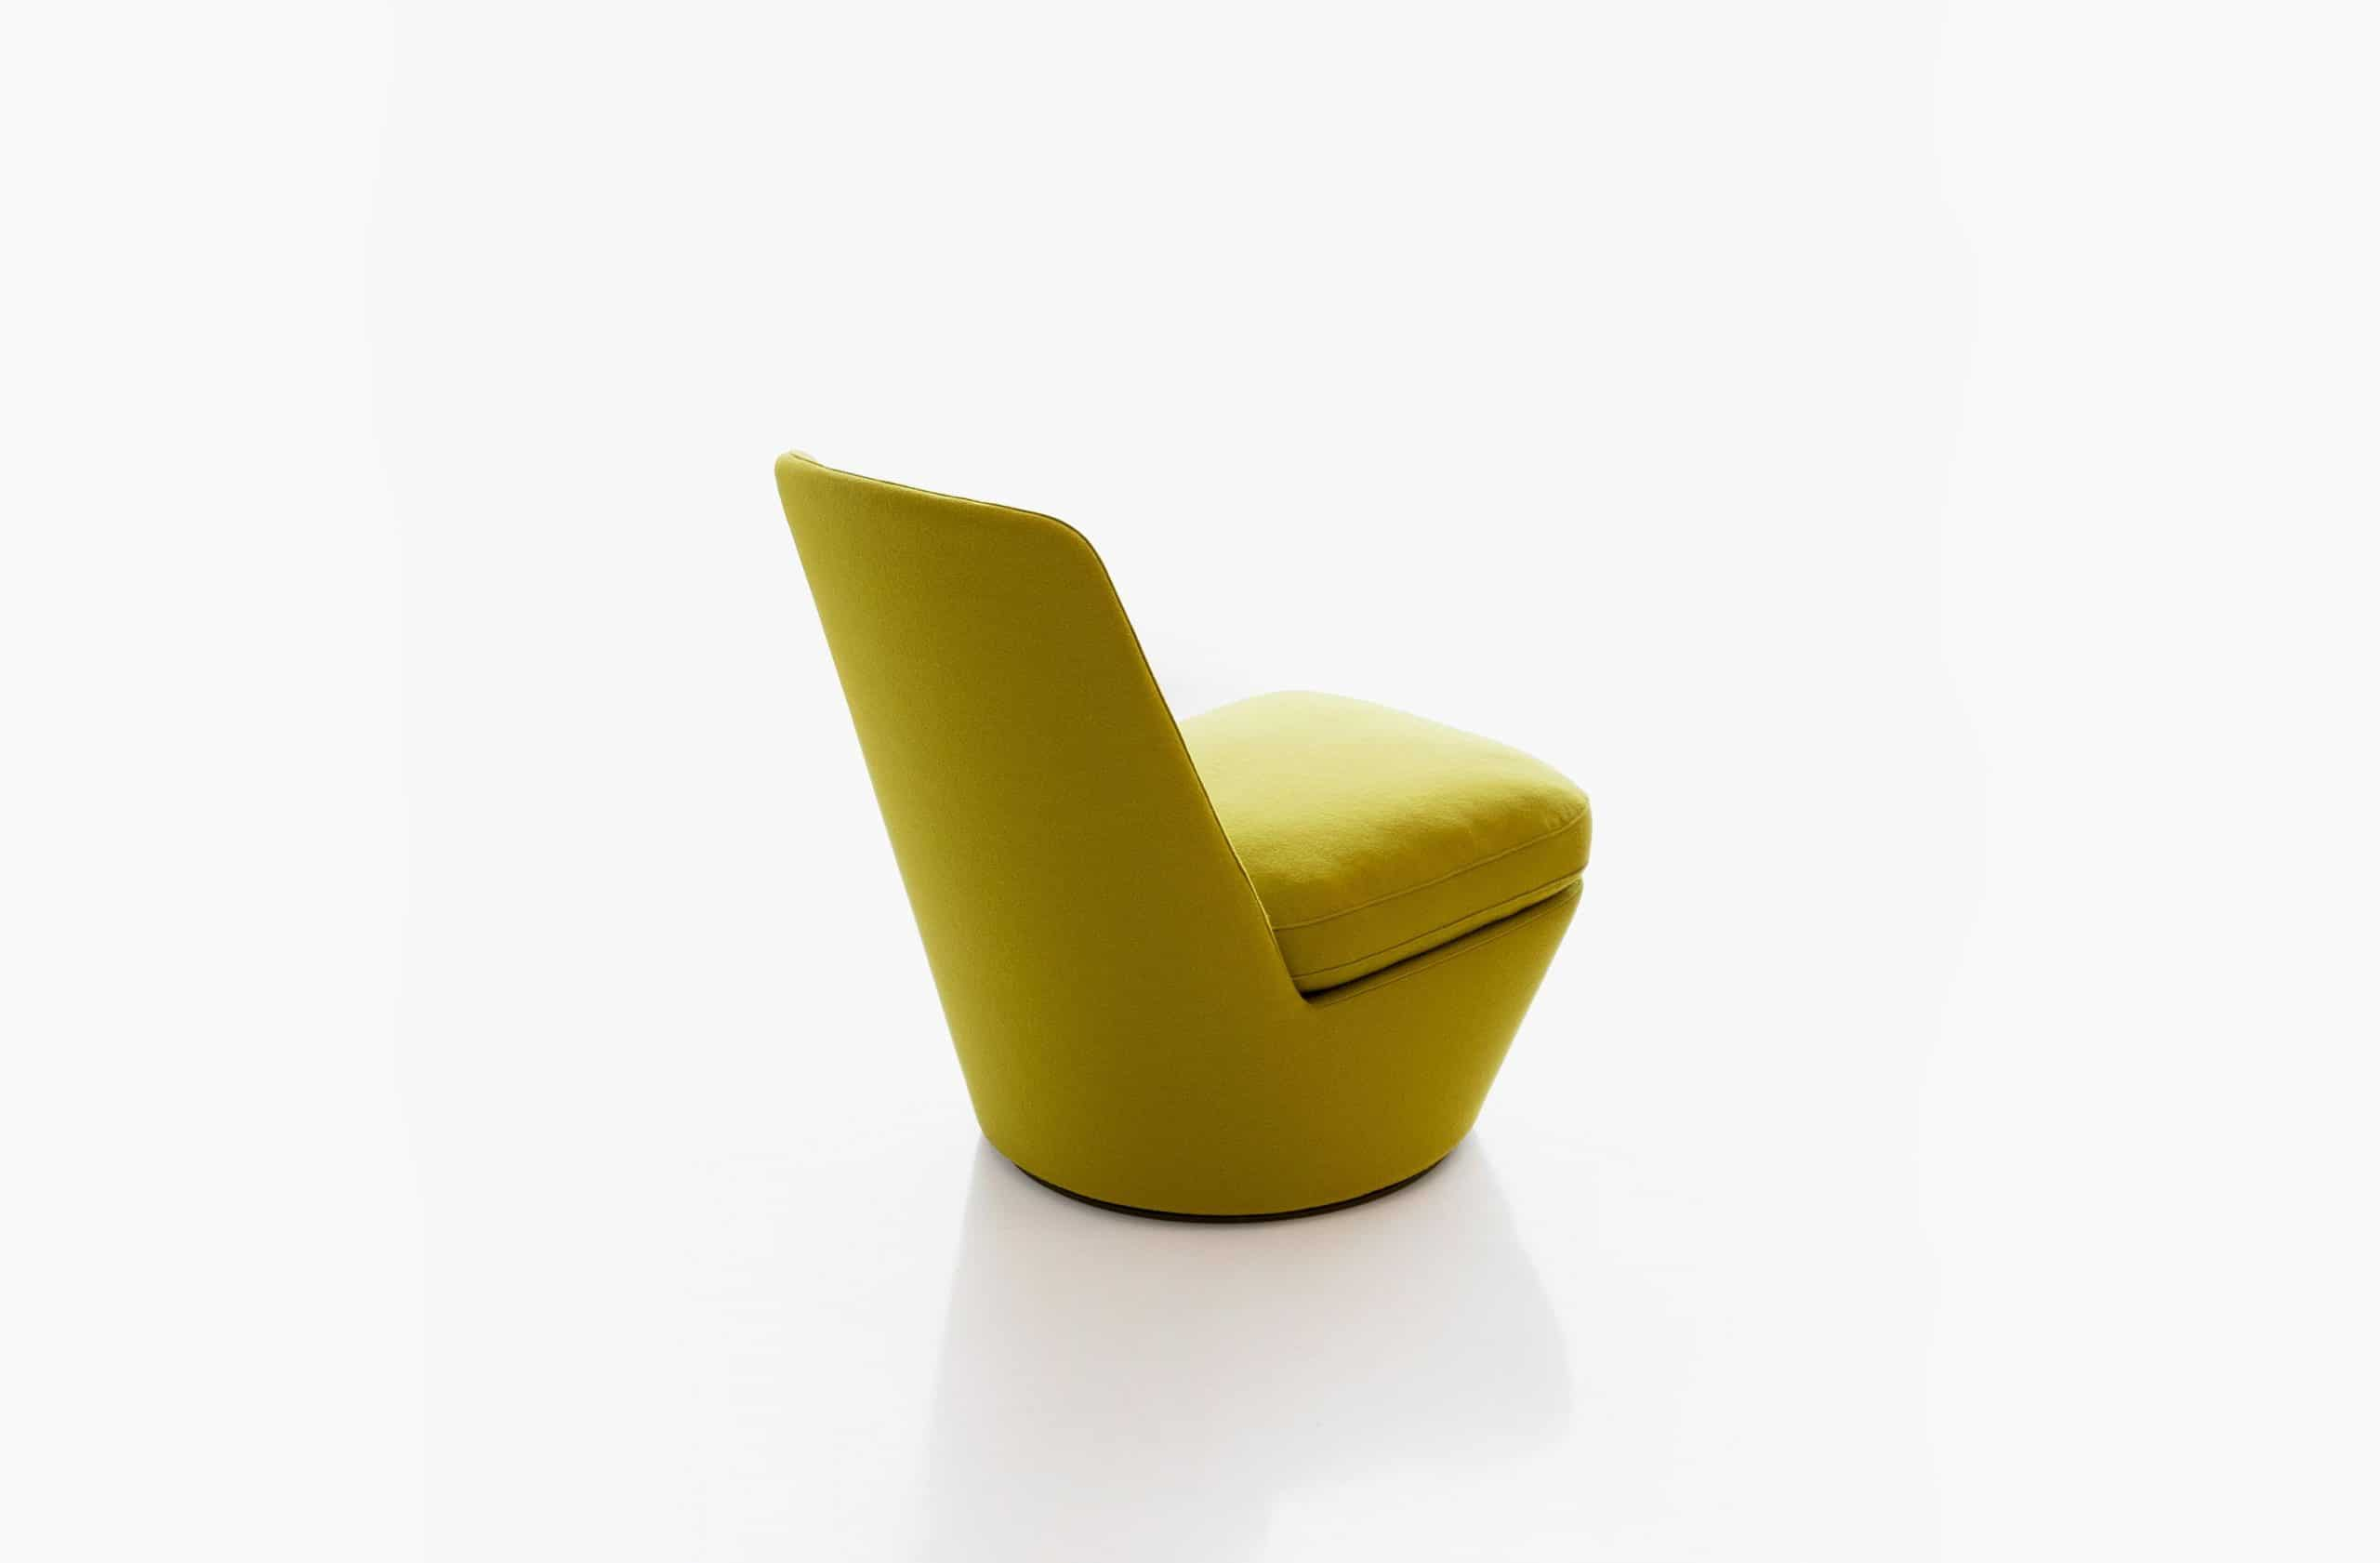 Bensen Pre chair 3